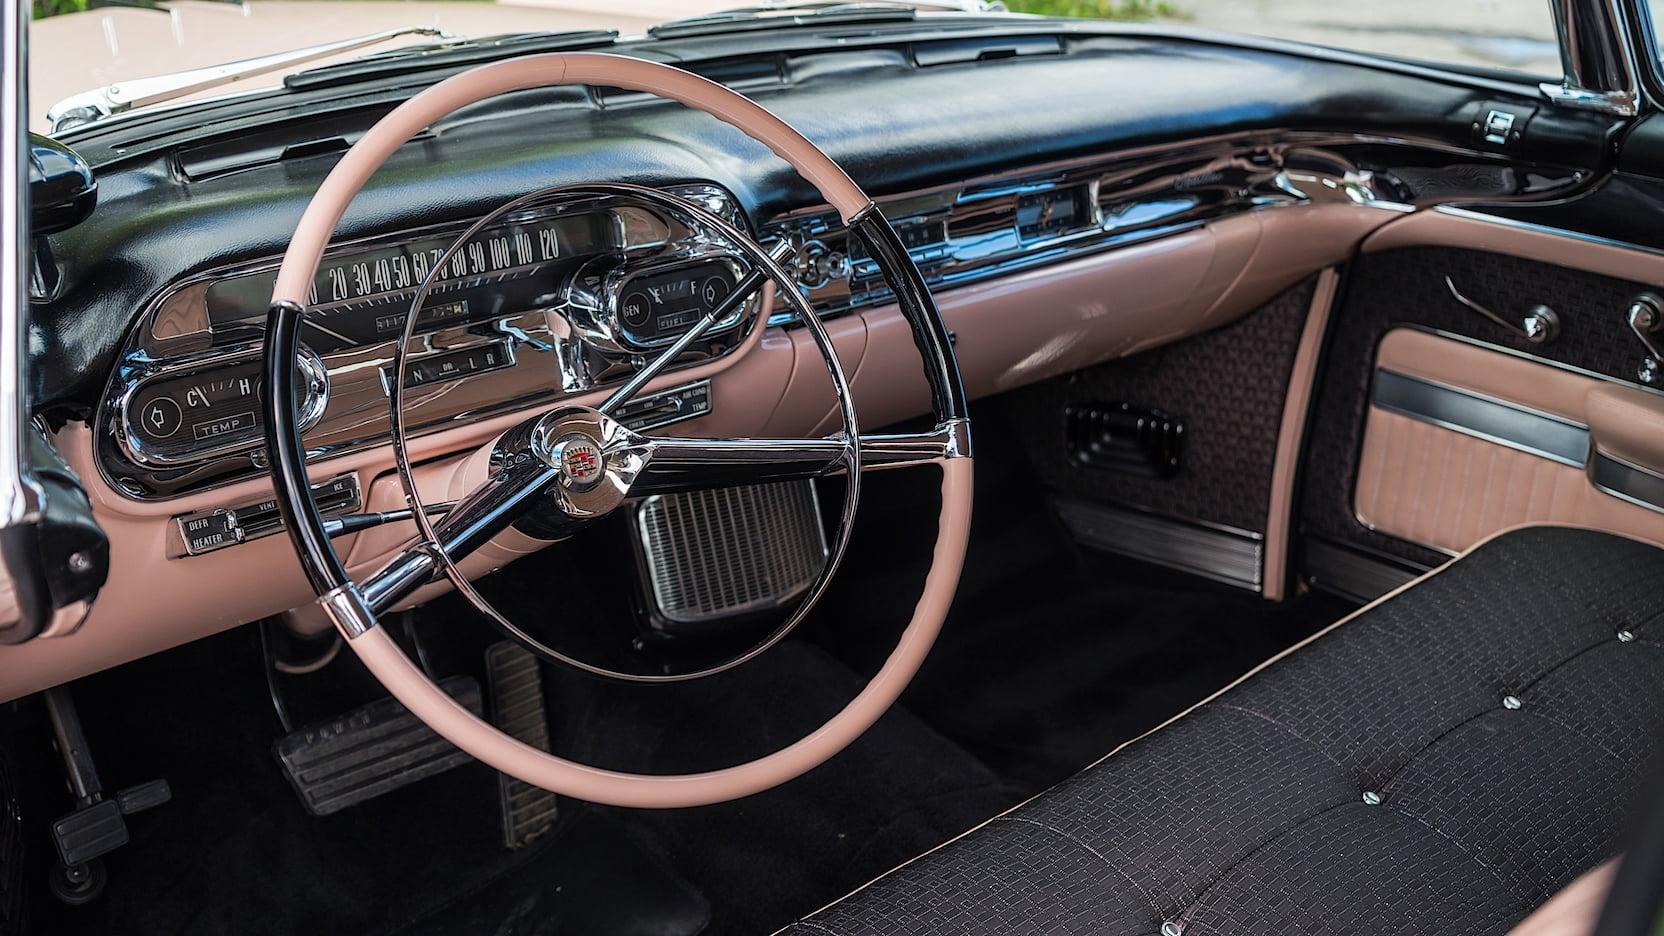 1957 Cadillac Sedan Deville Interior